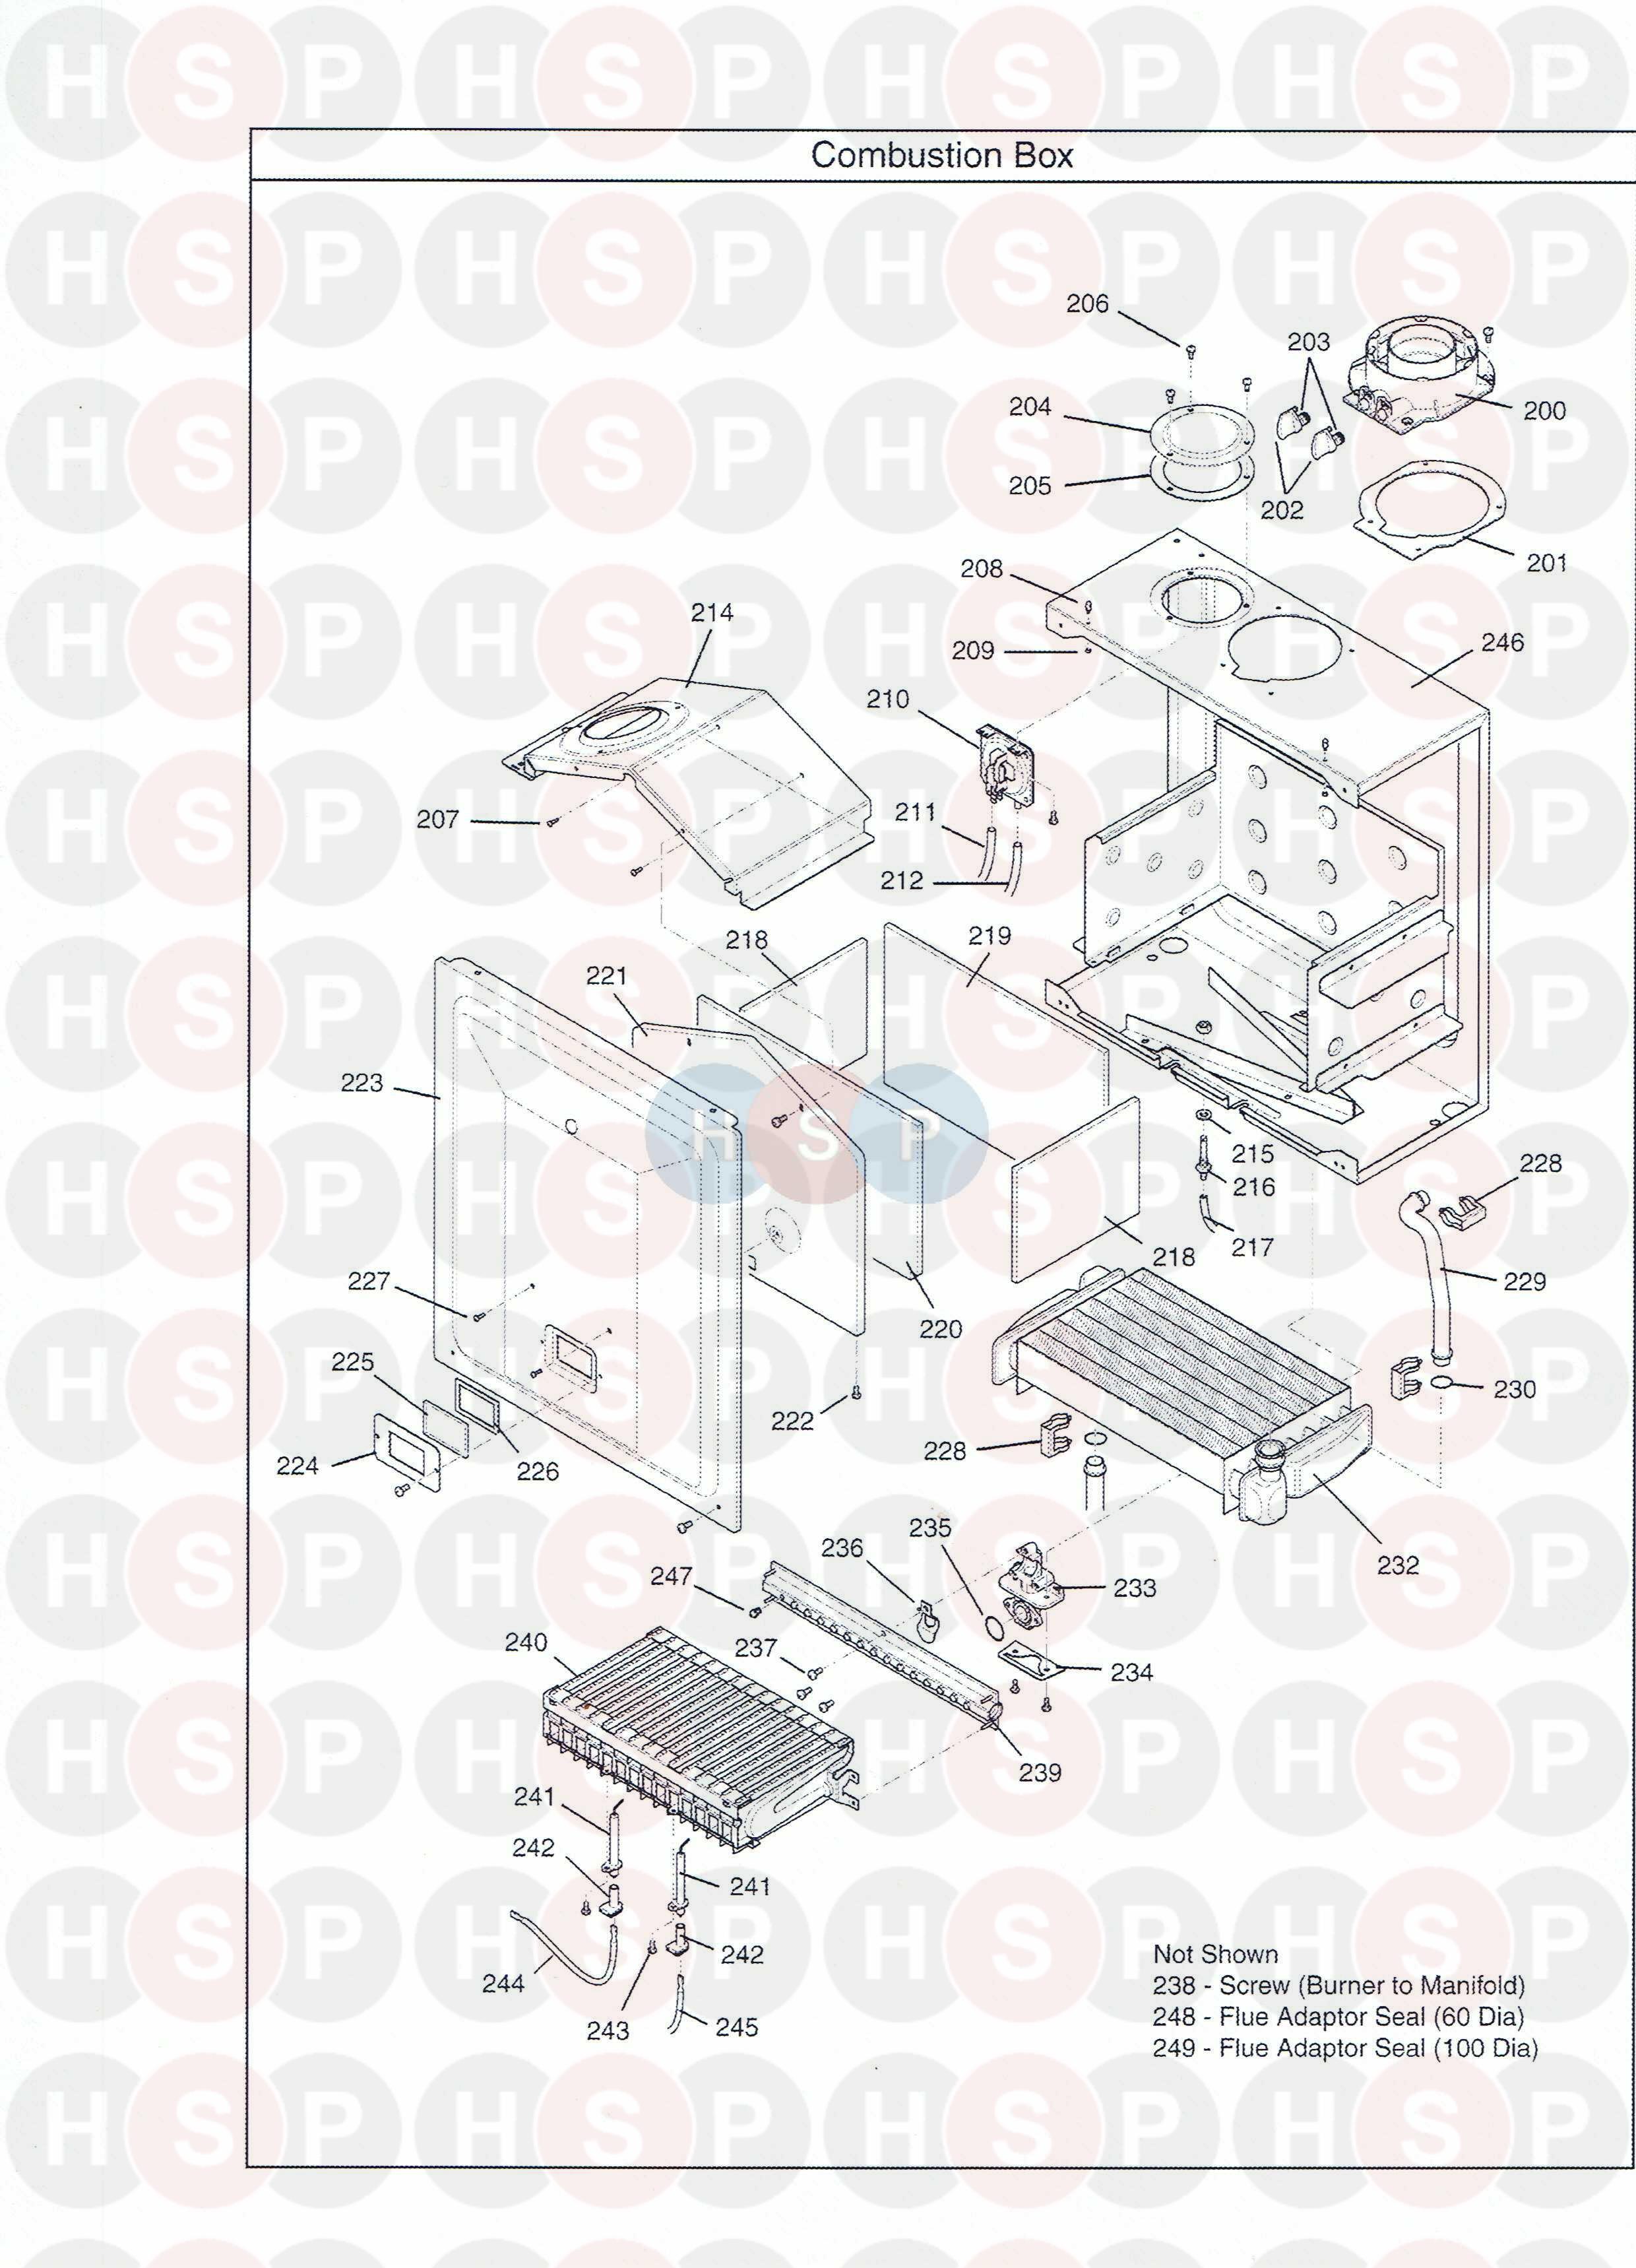 Potterton PERFORMA 30 HE Appliance Diagram (Combustion